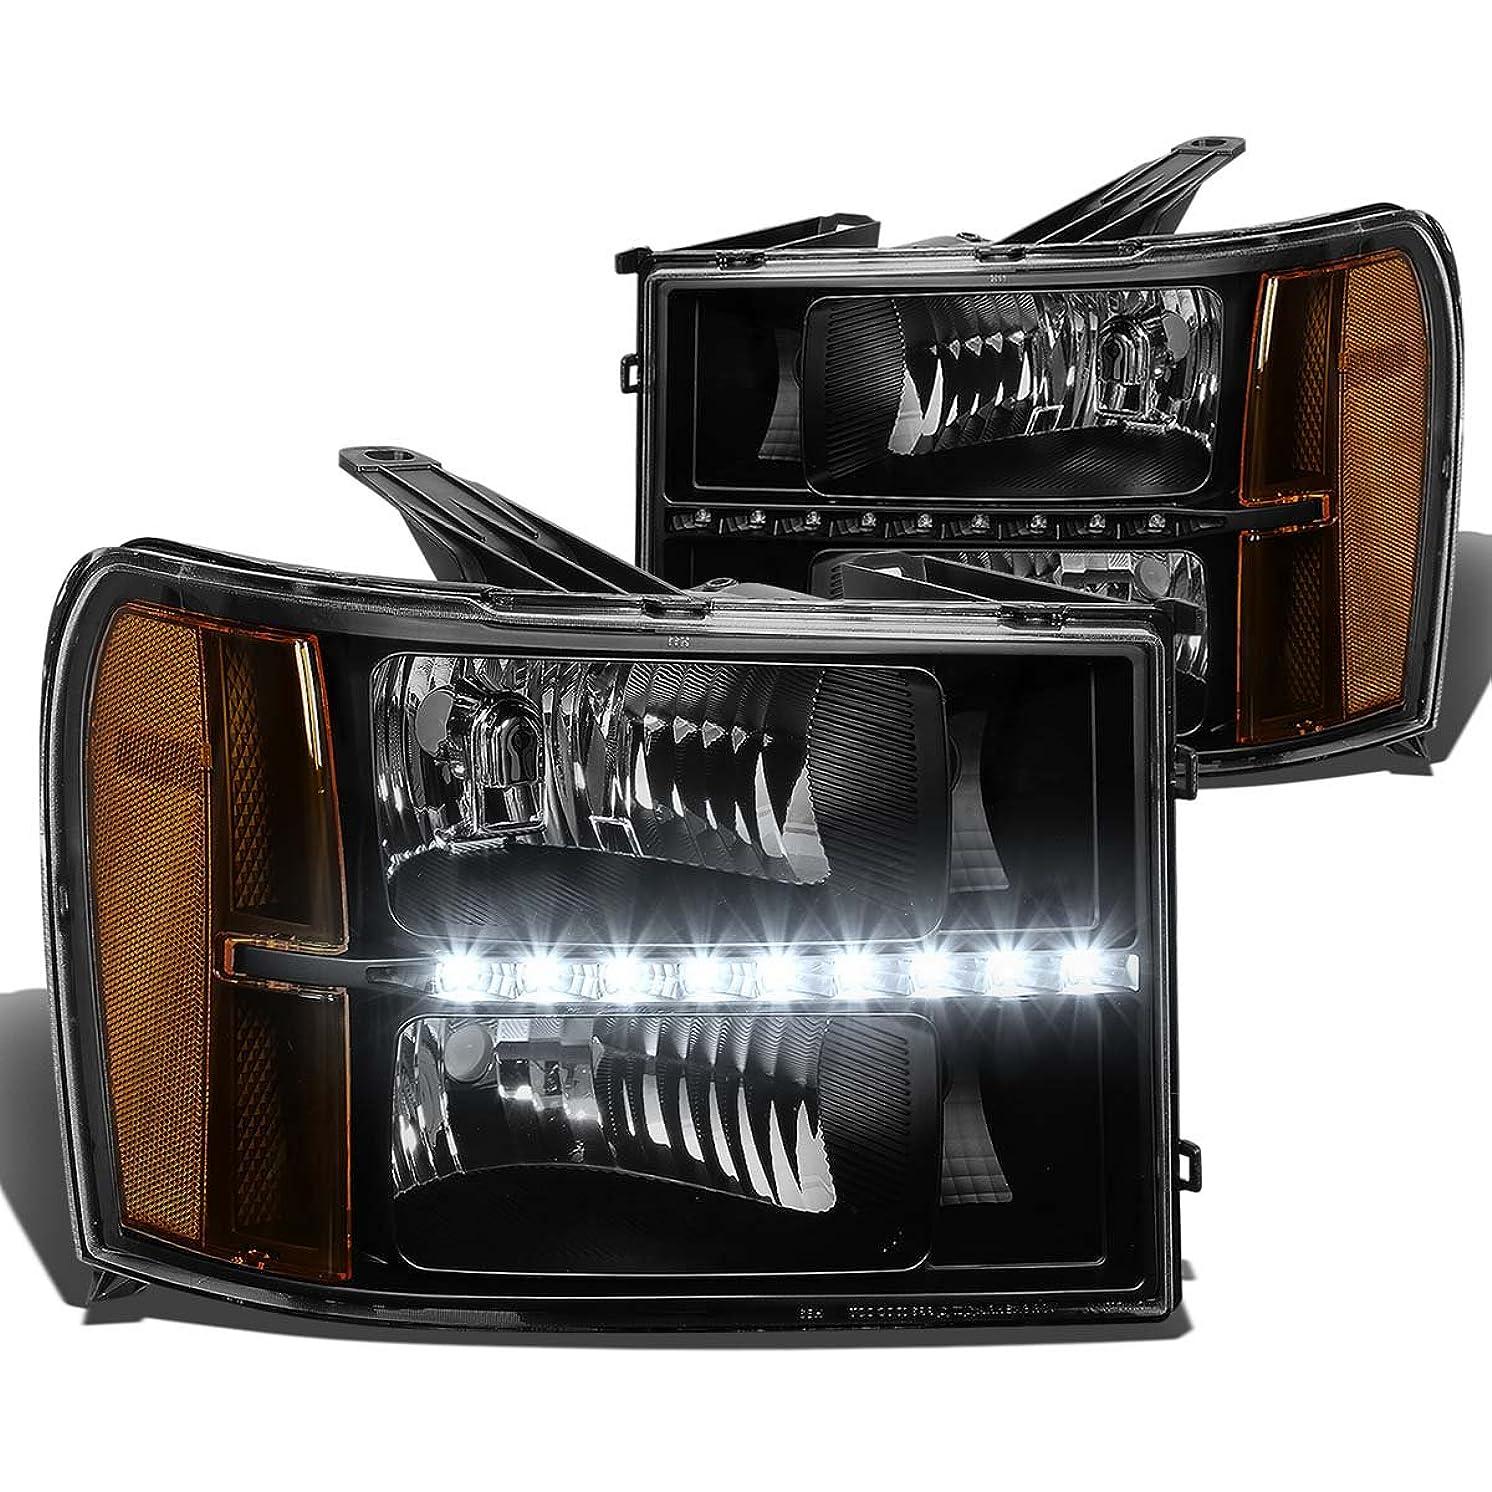 DNA Motoring HL-LED-GMCSIE07-BK-AM Headlight Assembly (Driver and Passenger Side)